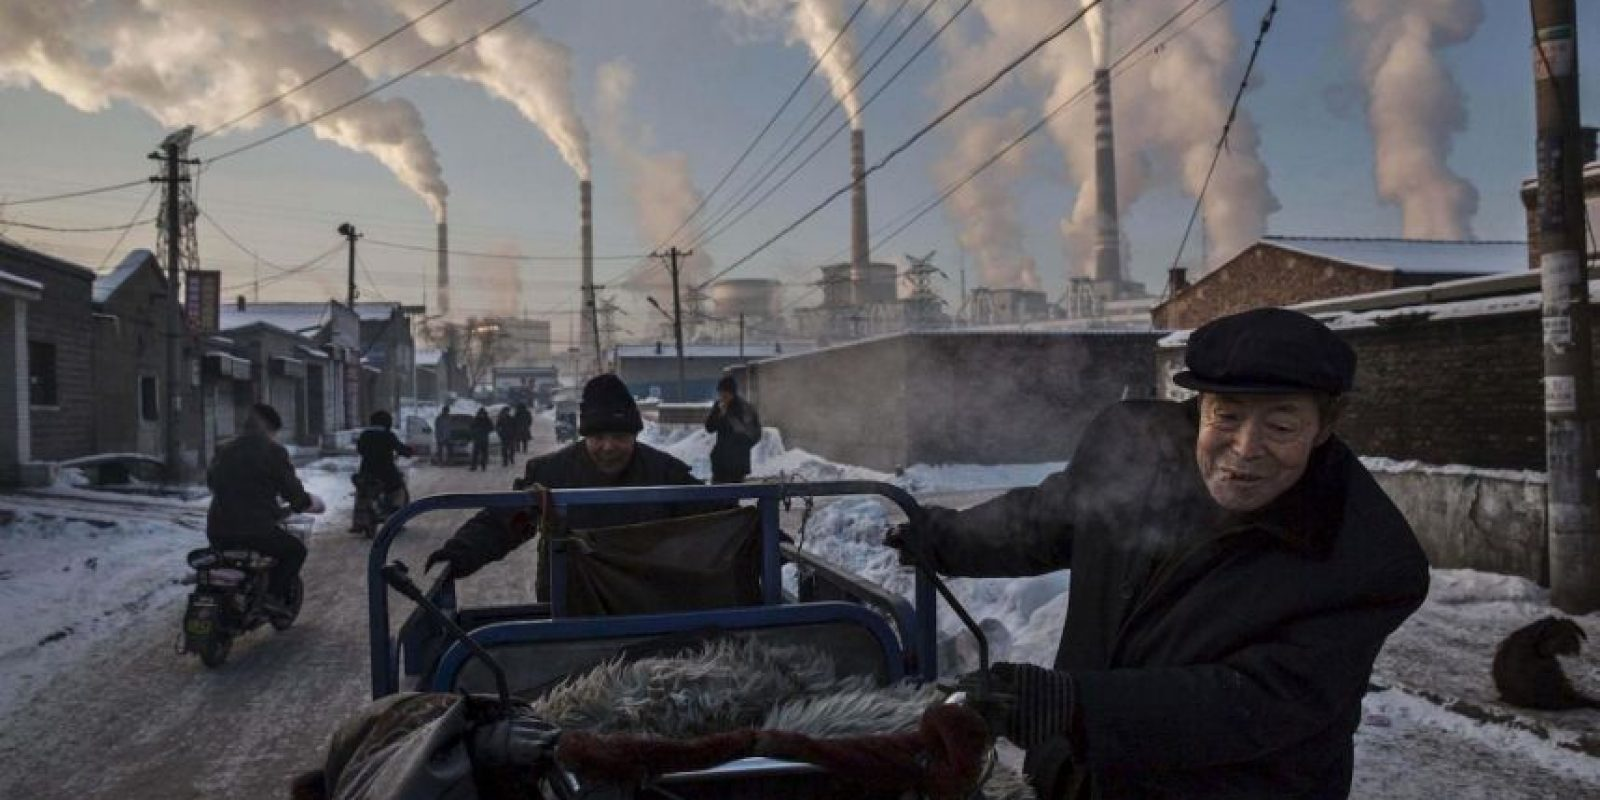 Kevin Frayer. Un anciano chino empuja un triciclo junto a un fábrica en China Foto:worldpressphoto.org